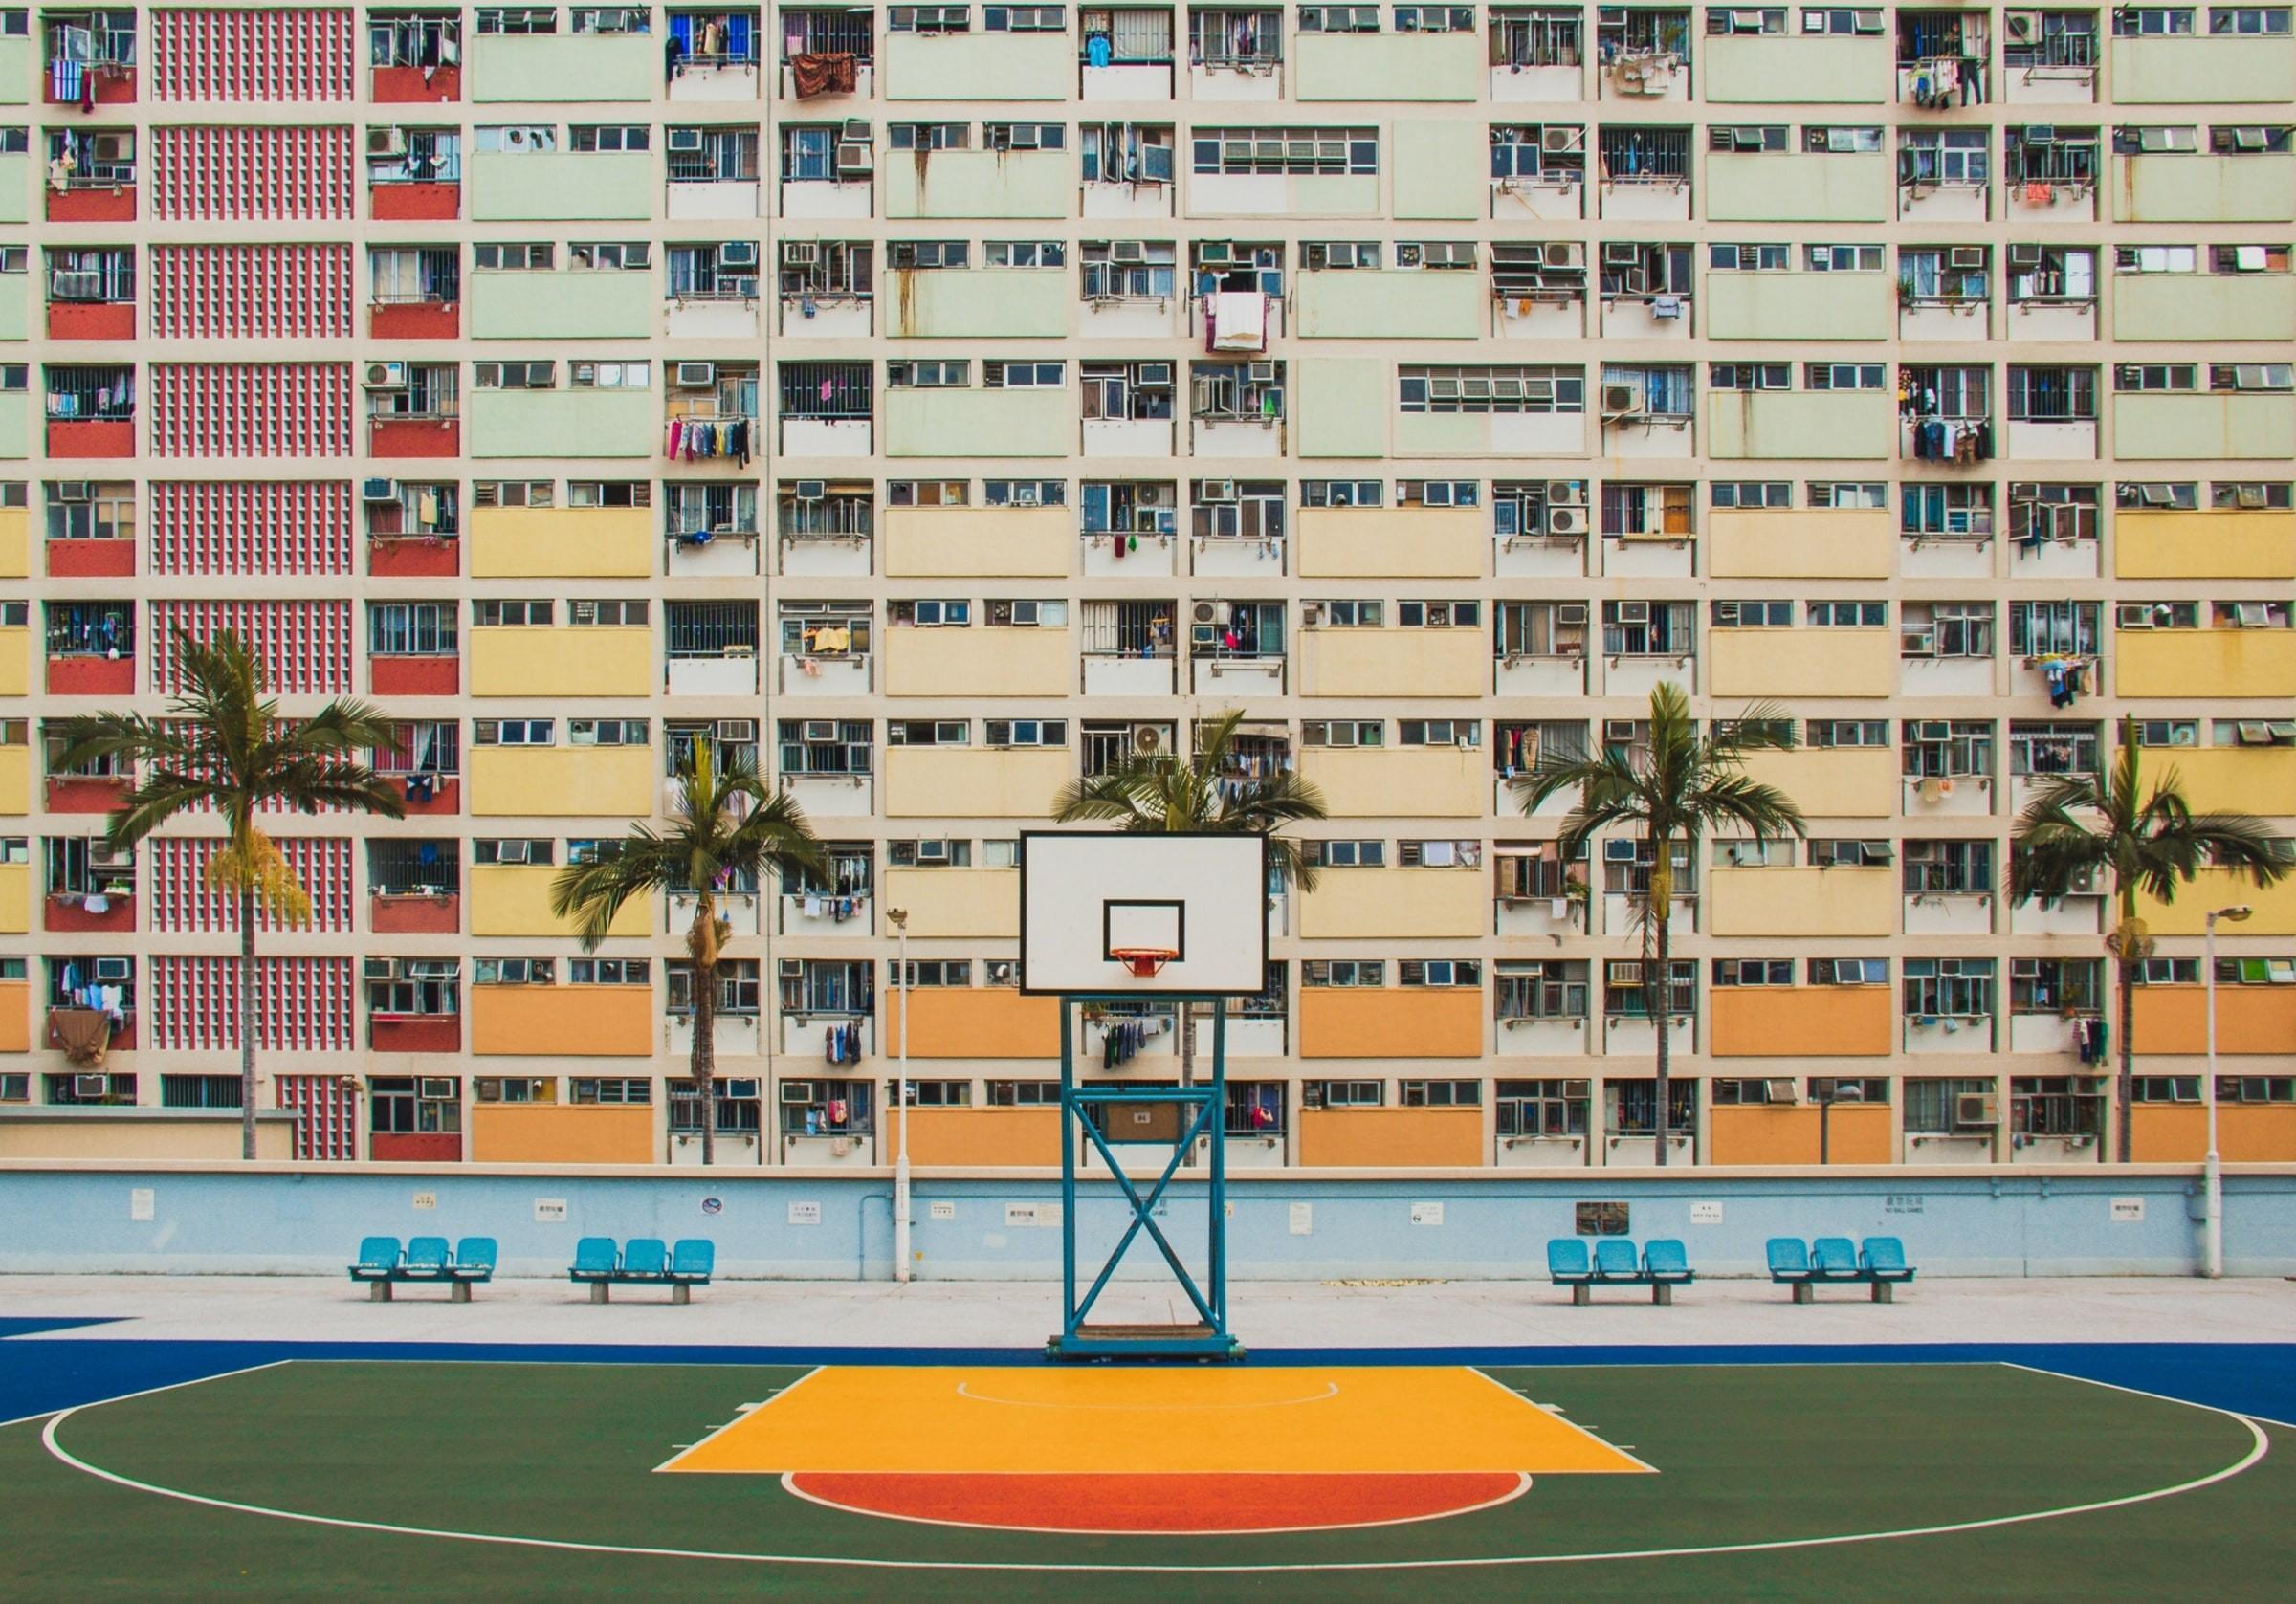 Flats in Hong Kong